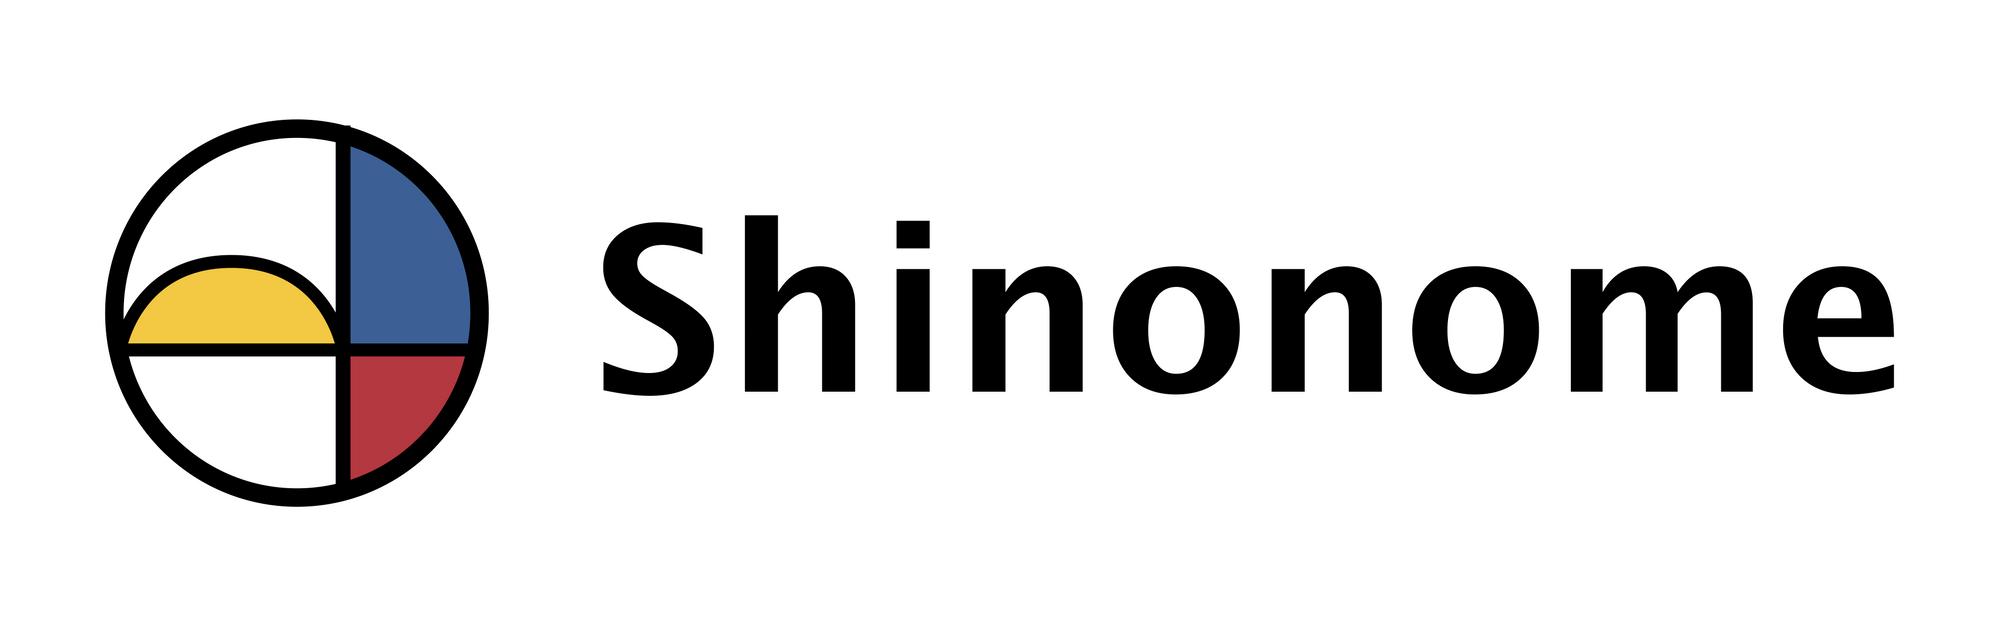 Shinonome Technology Blog